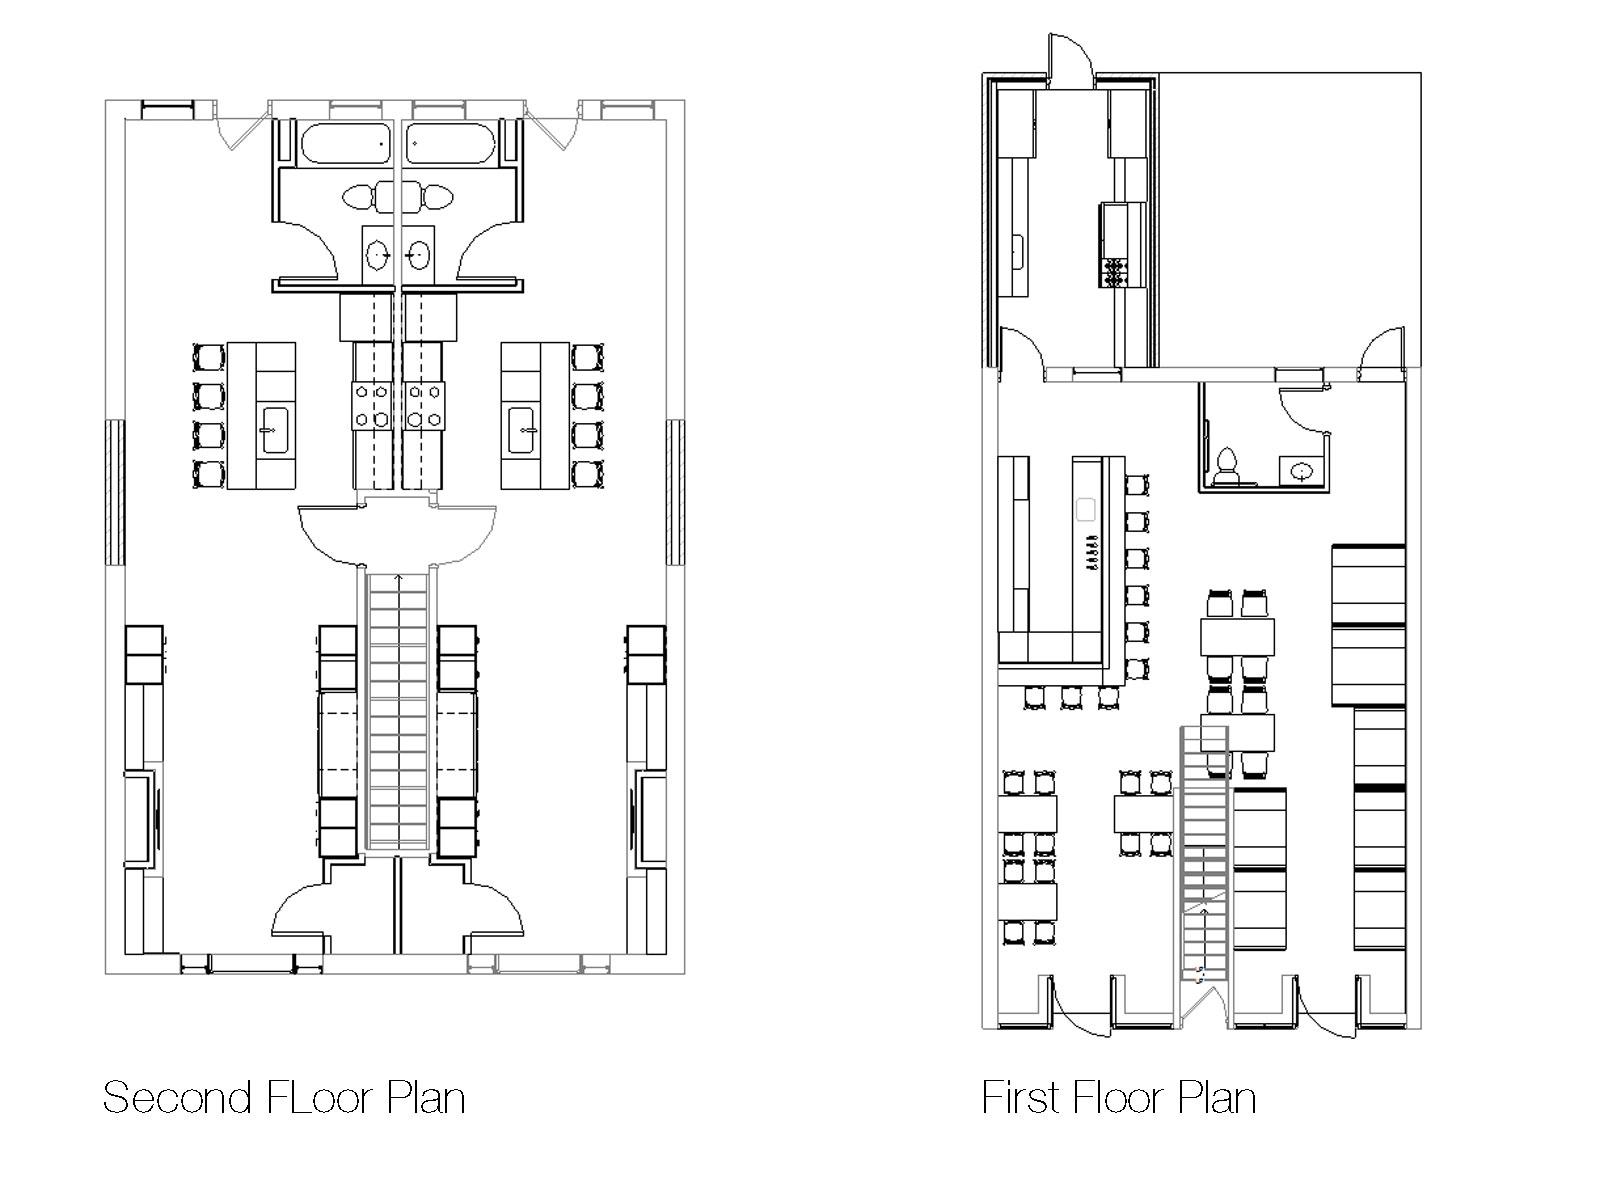 5x30 Restaurant and Apartment Floor Plans